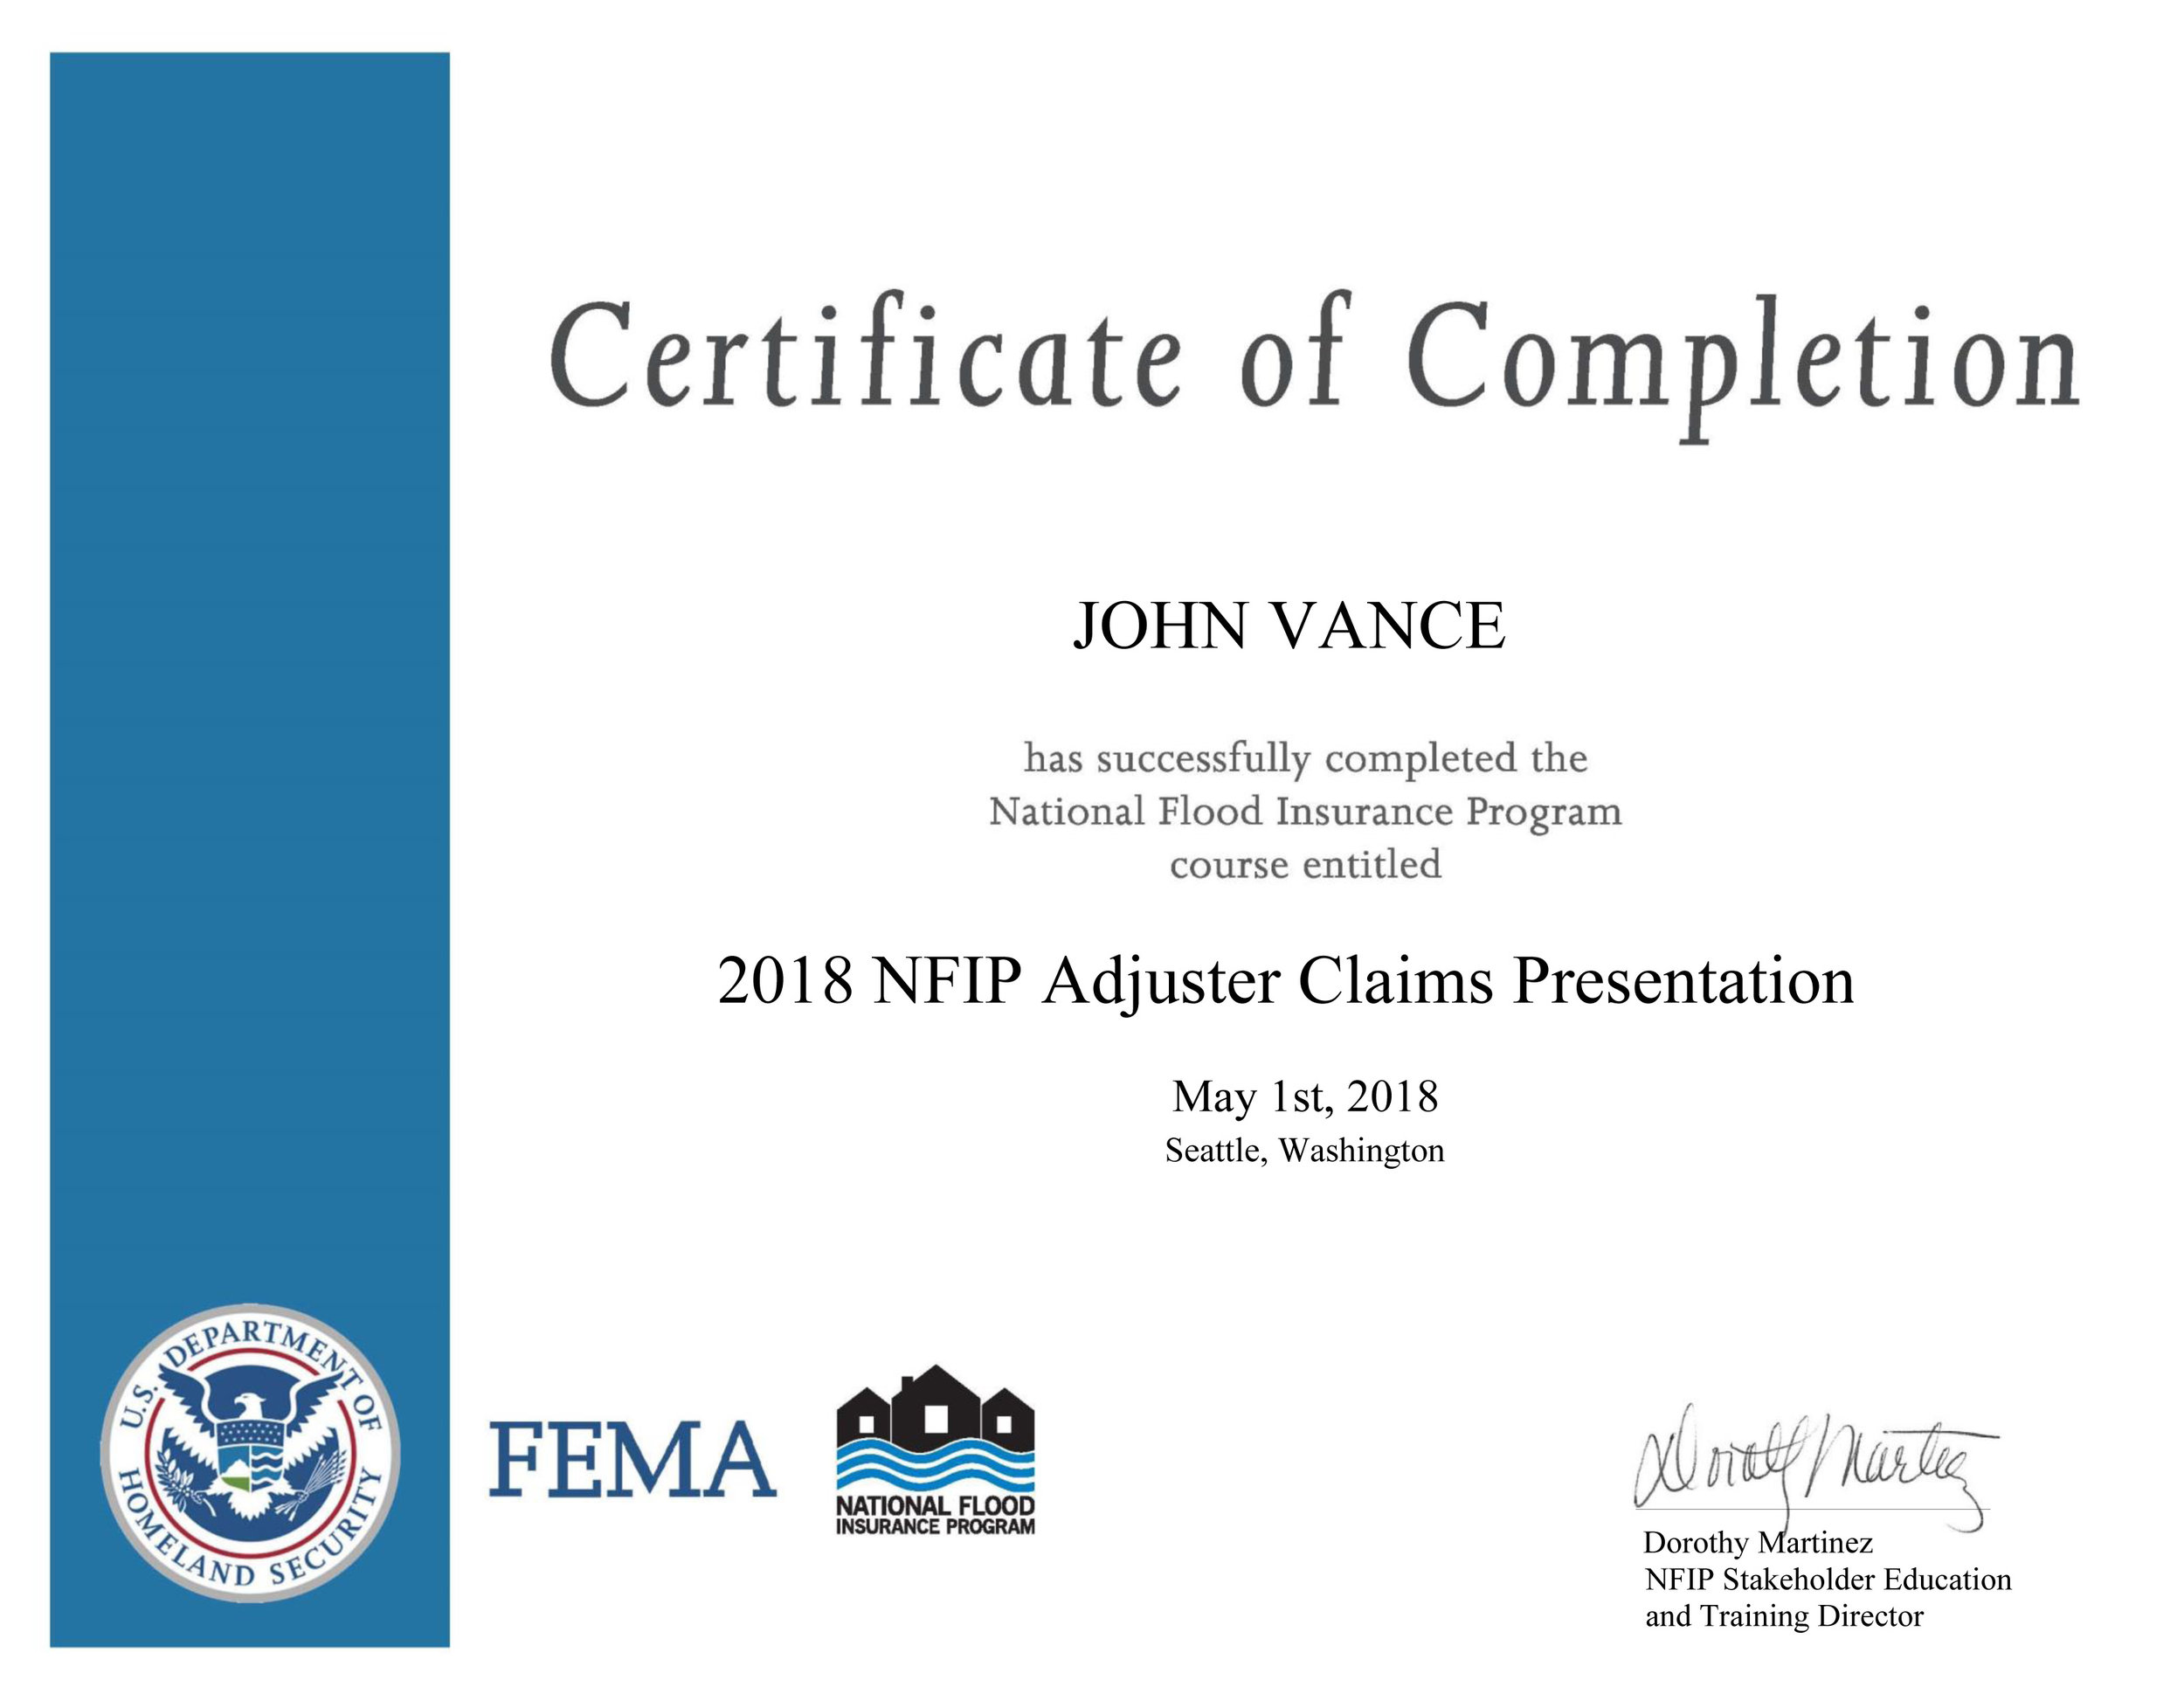 Vance 2118 NFIP_Adjuster_Presentation_Certificate_2018.jpg